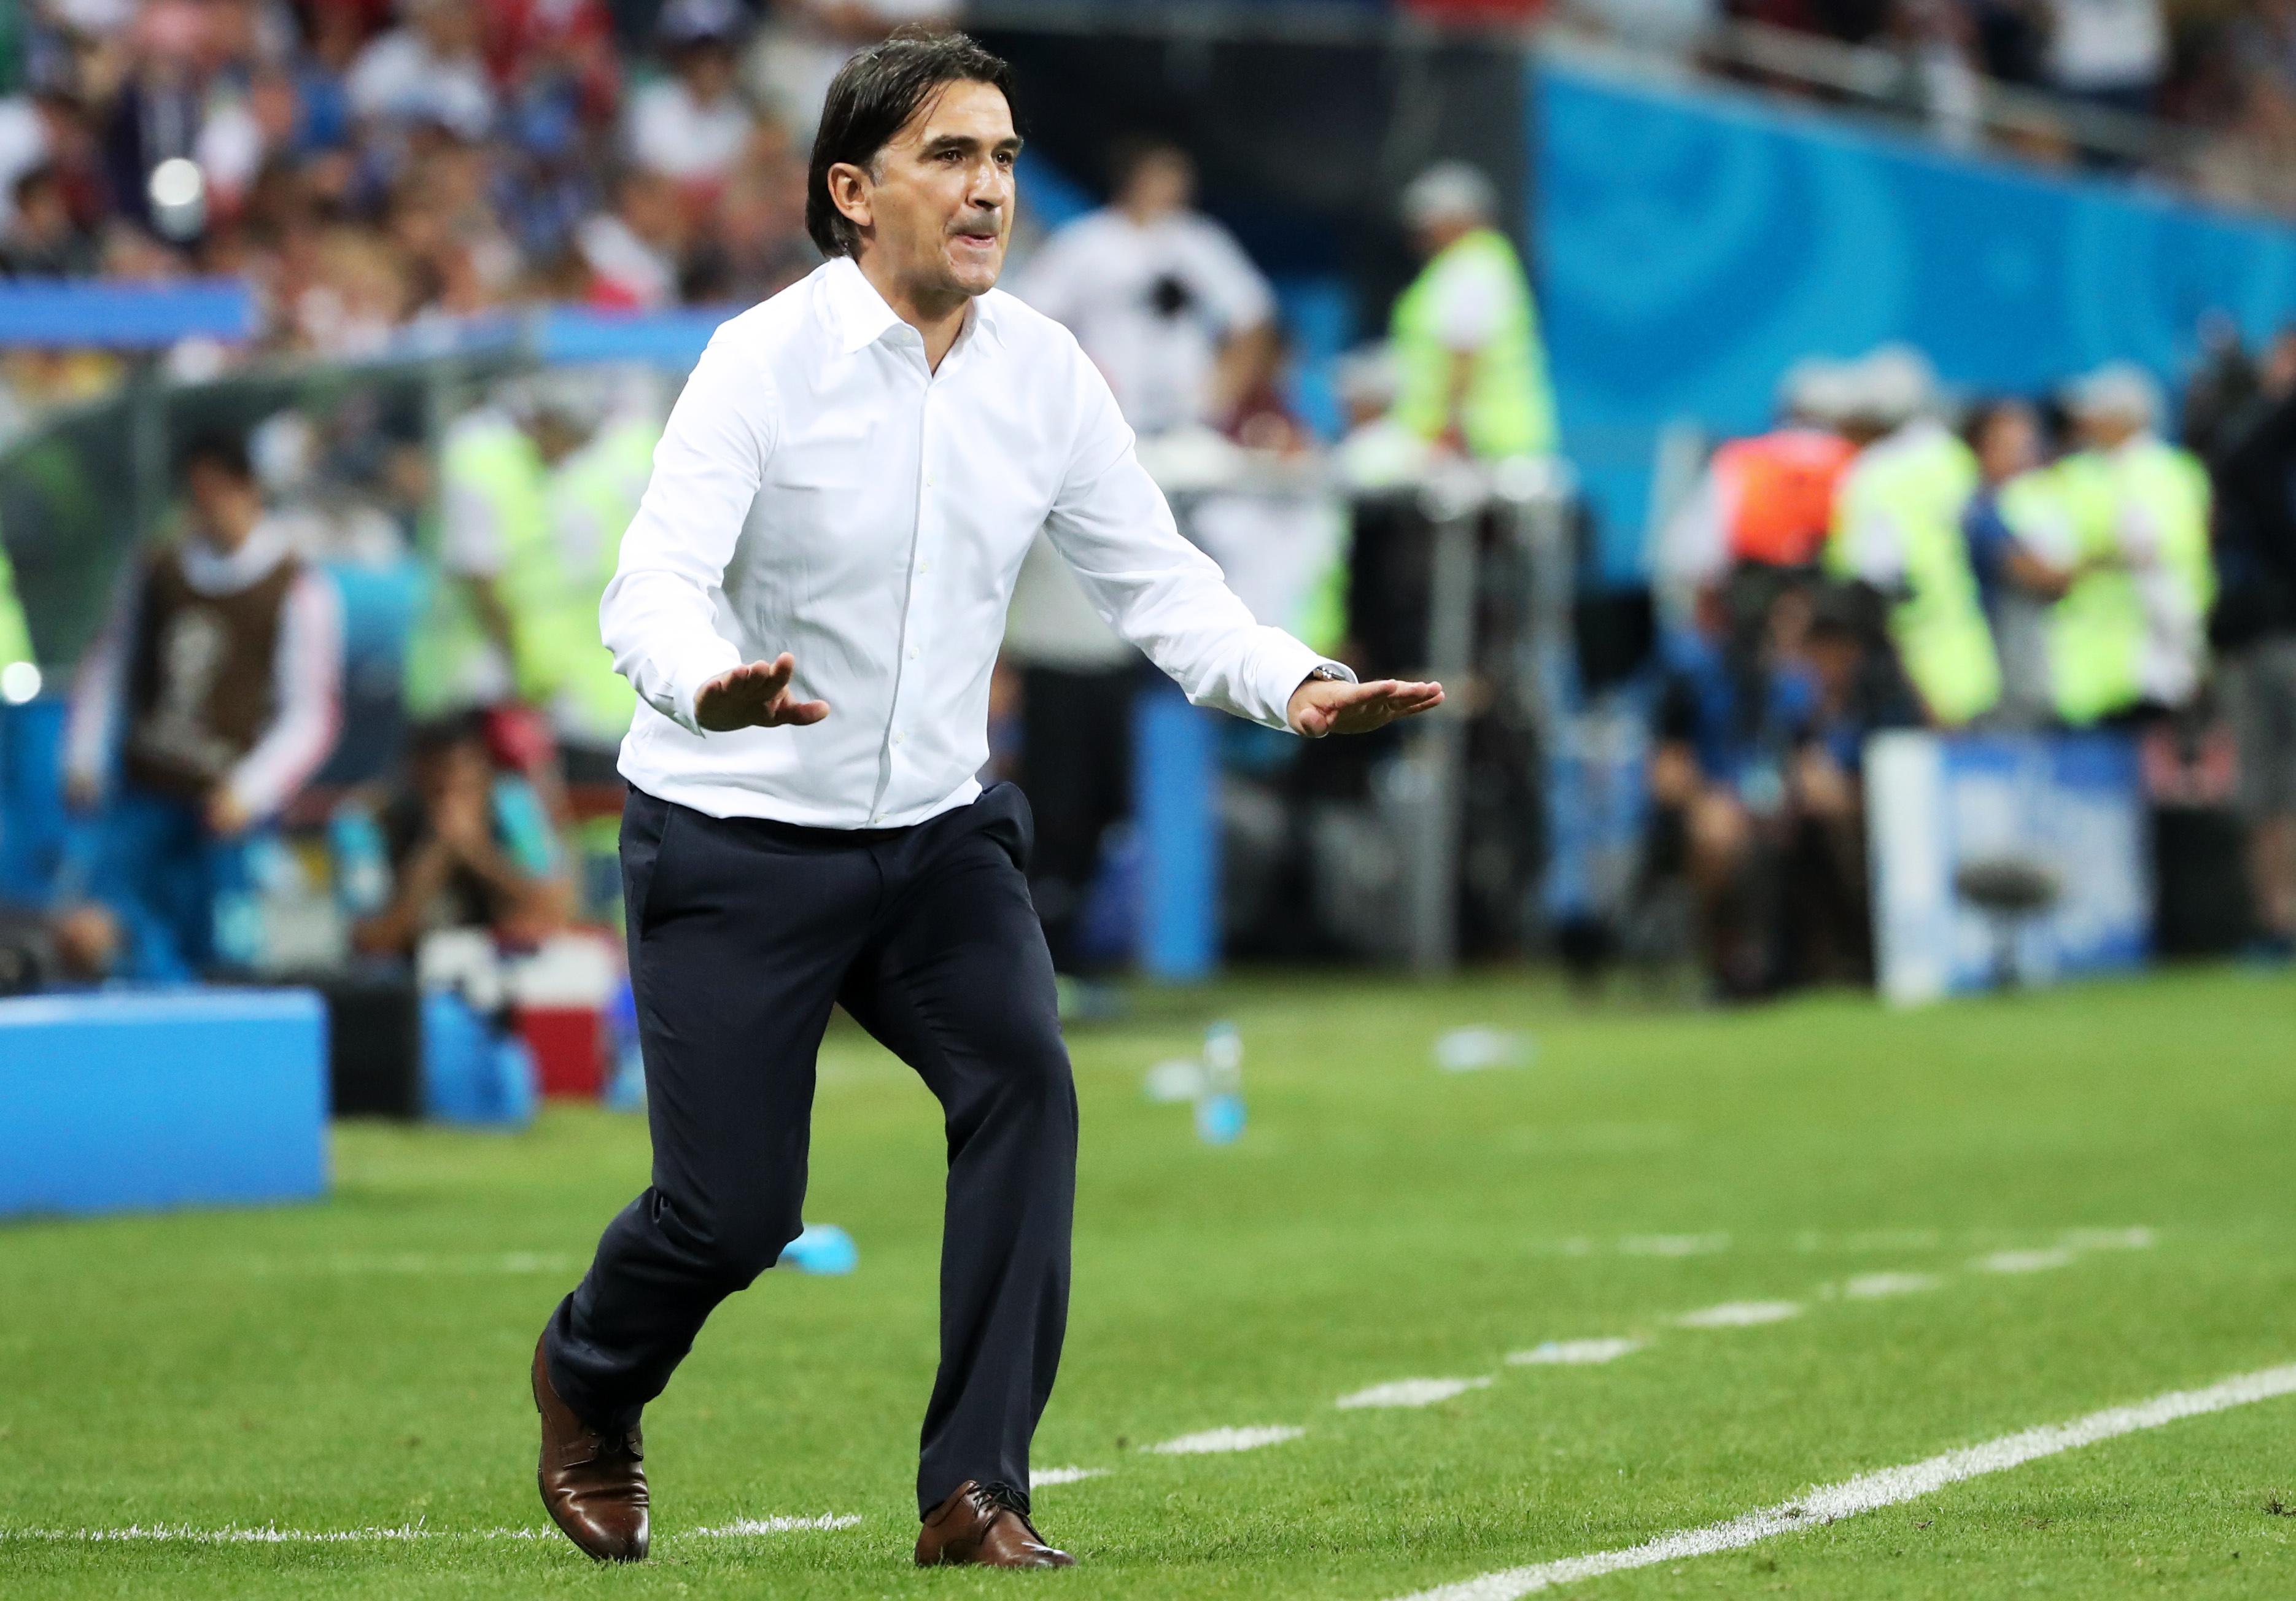 Football - Coupe du monde - Zlatko Dalic, un illustre inconnu comme homme providentiel